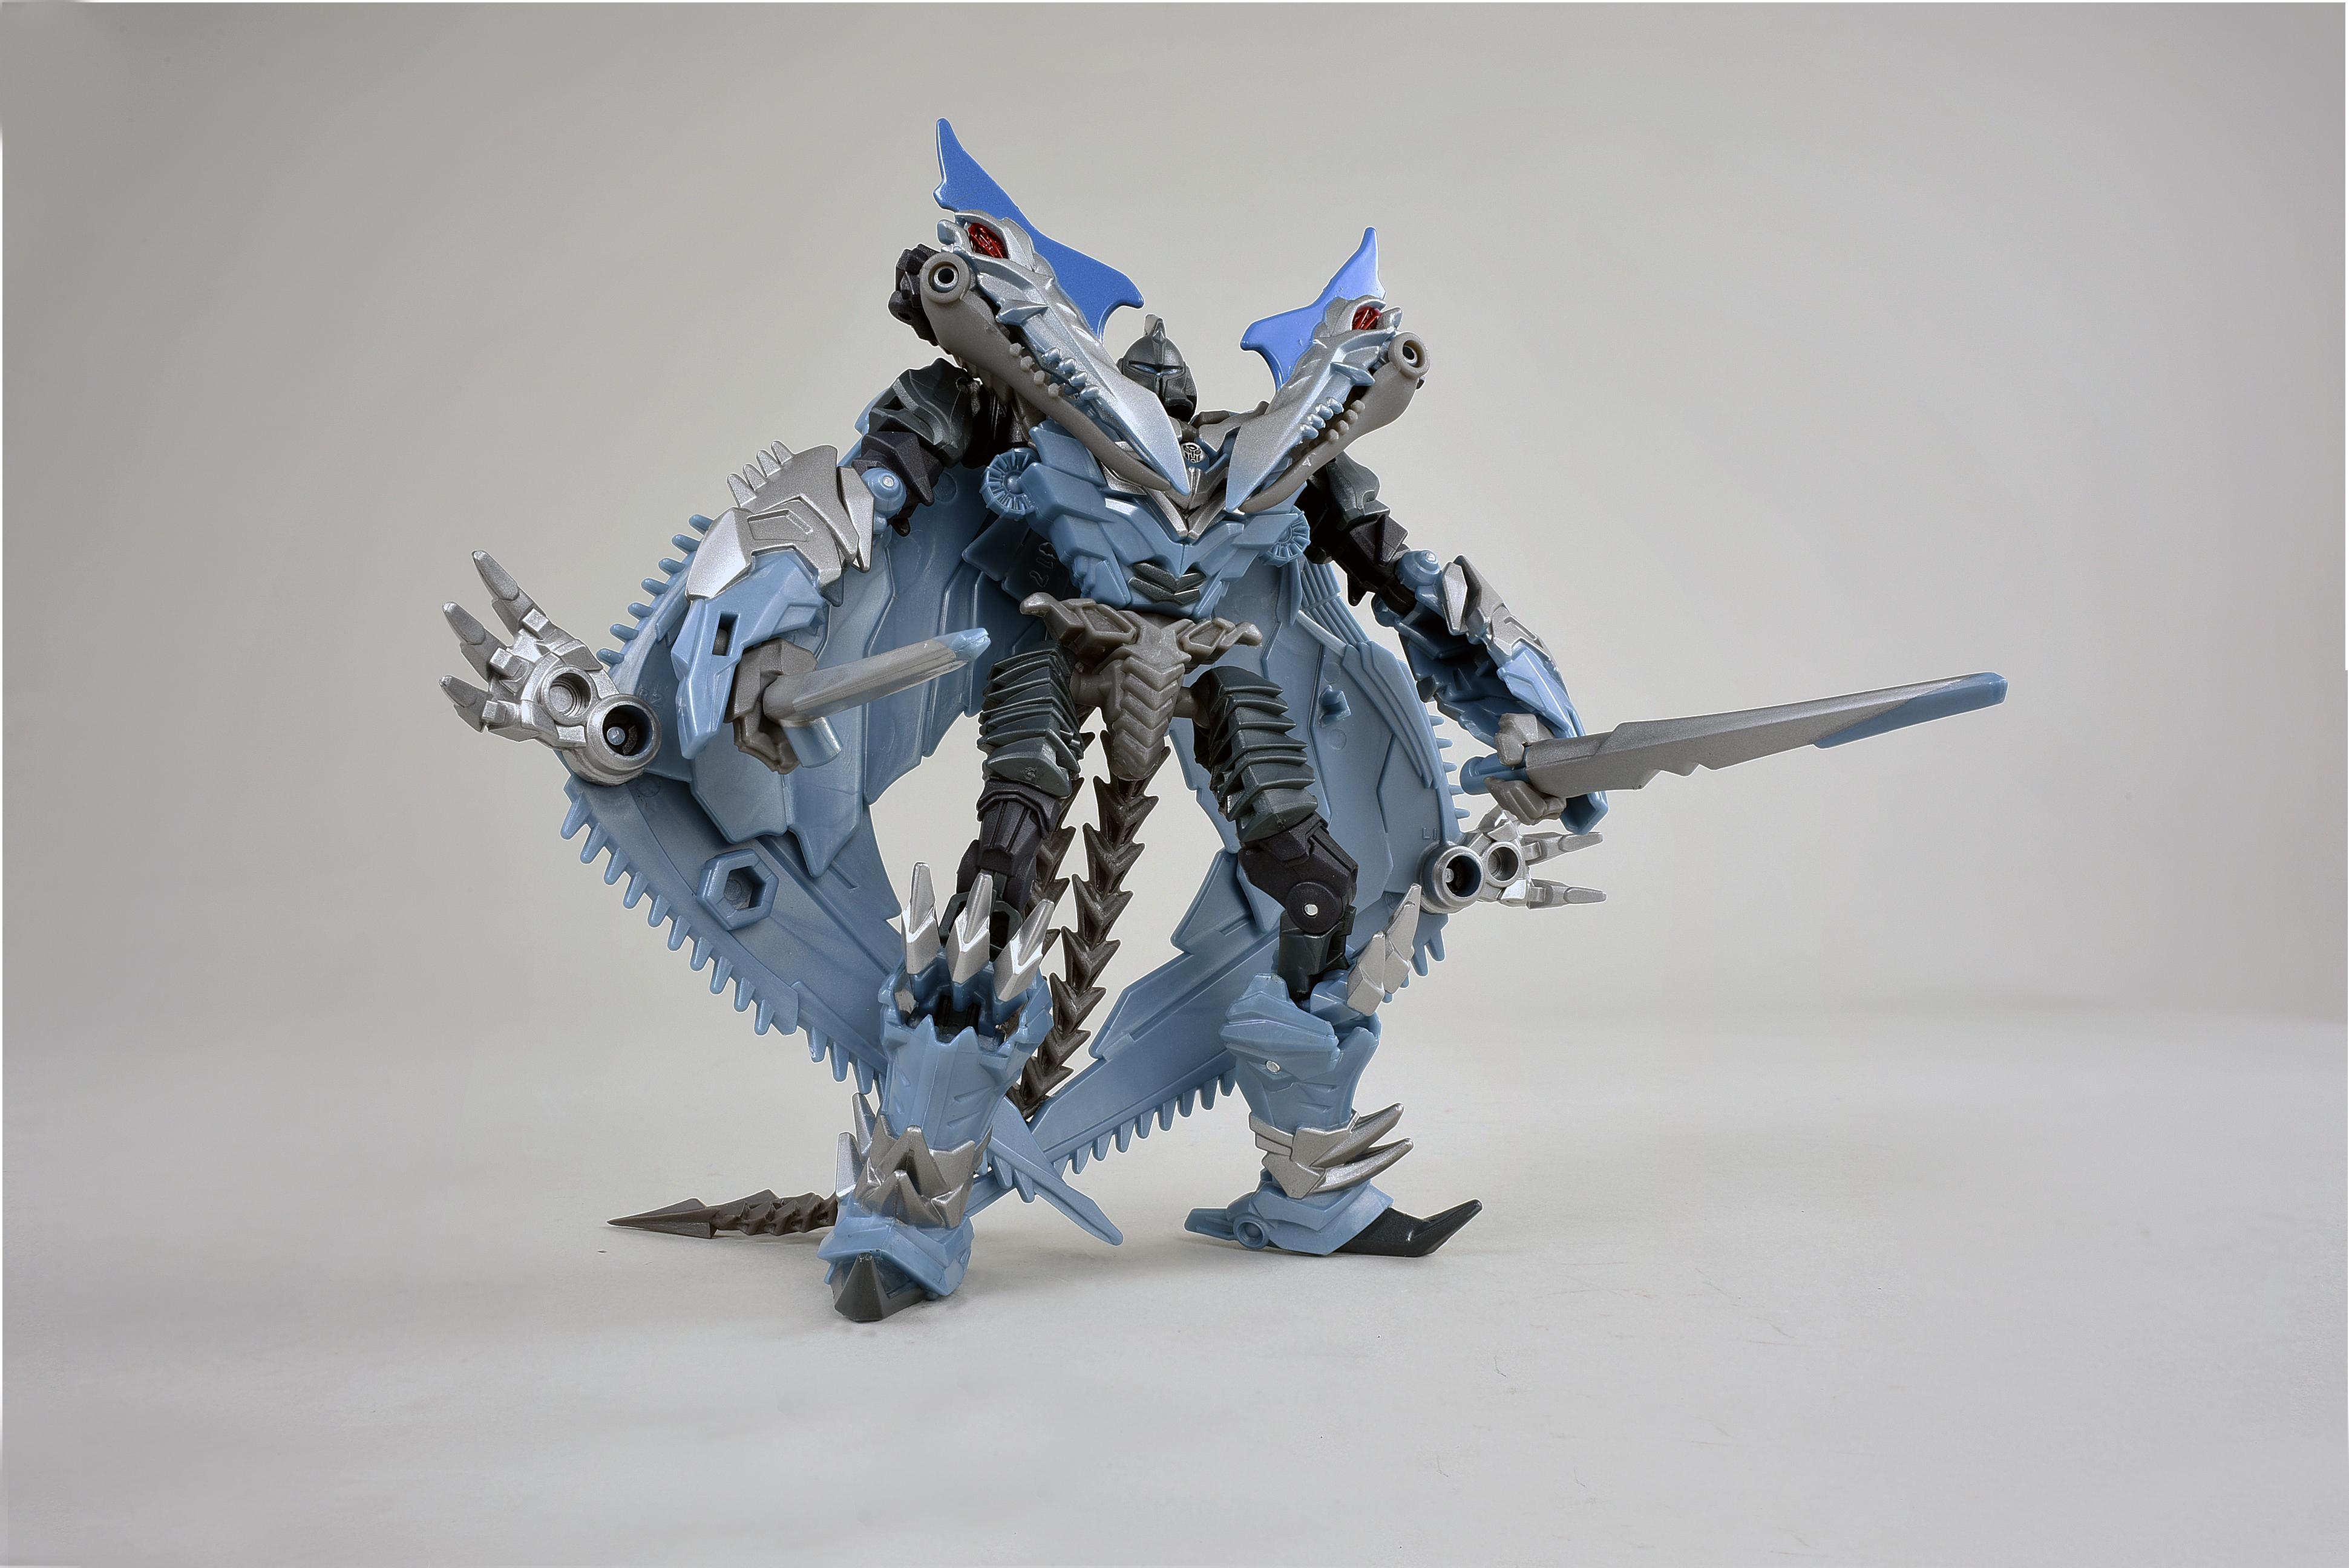 Transformer movie tlk 23 strafe aus anime collectables anime transformer movie tlk 23 strafe jeuxipadfo Images